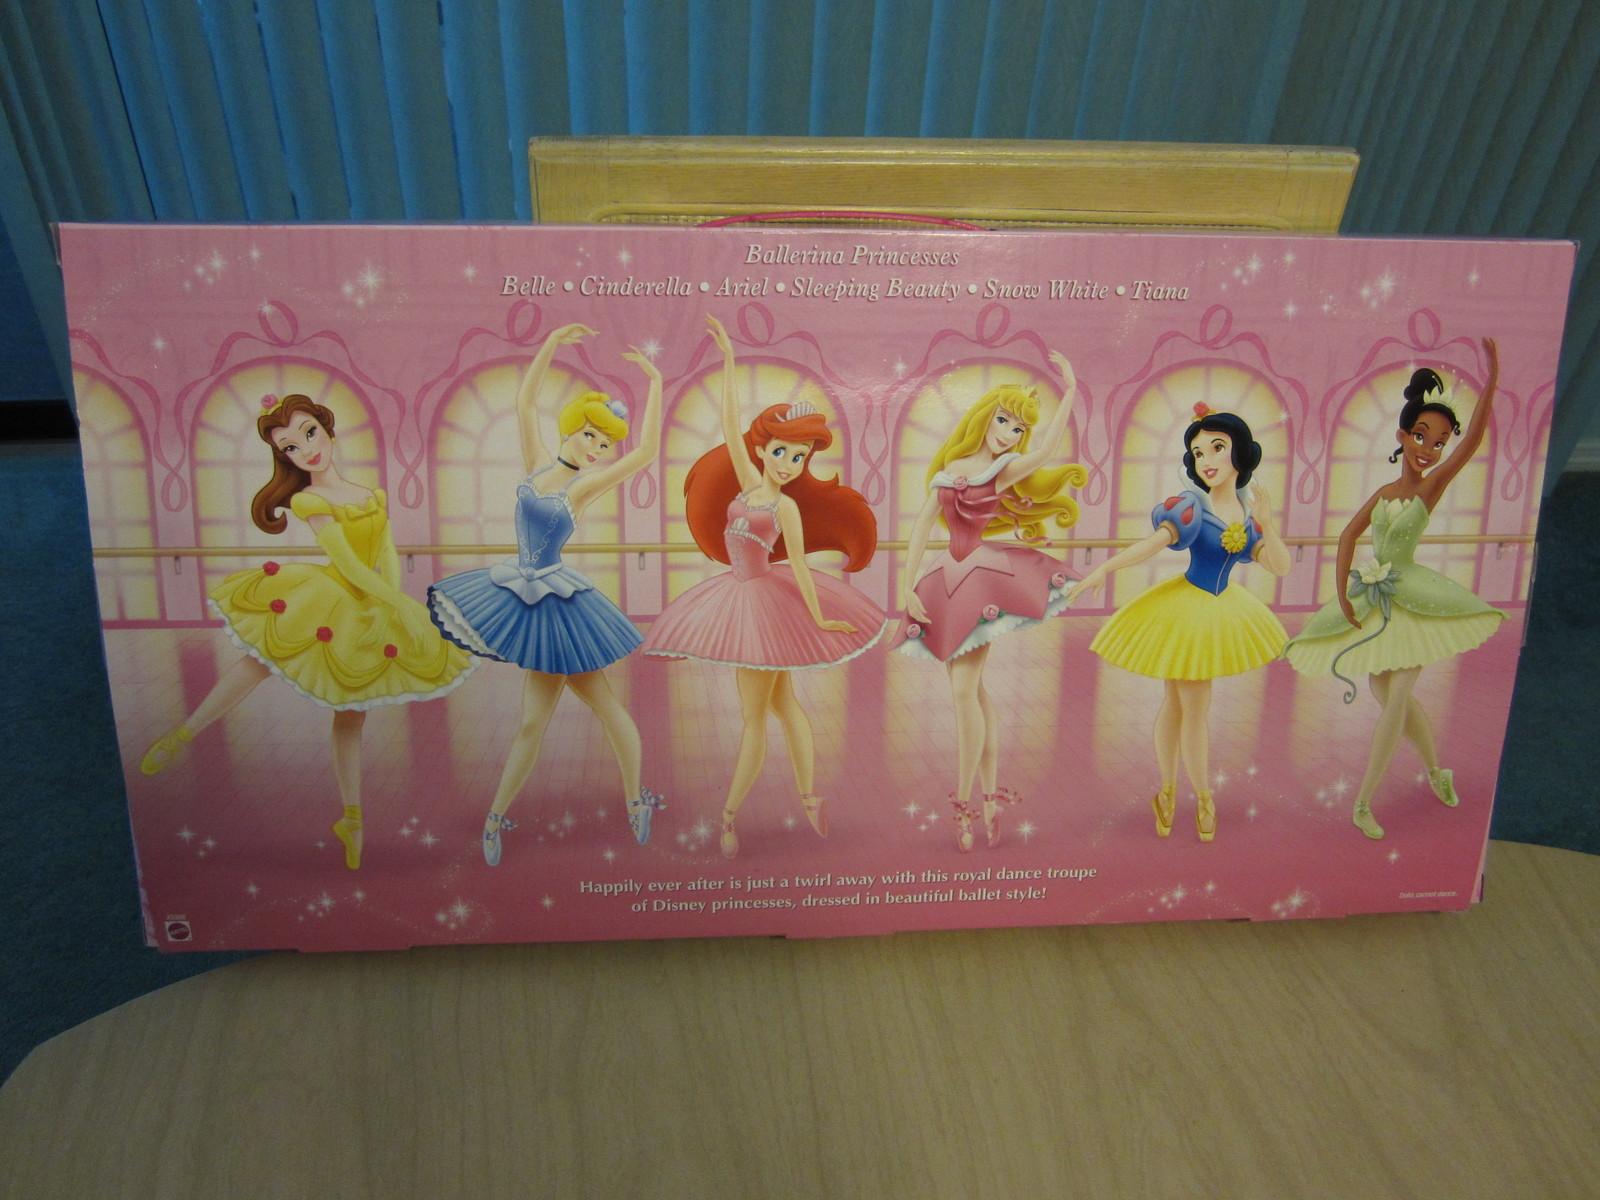 New 2012 Ballerina Princess Doll Pack With Aurora